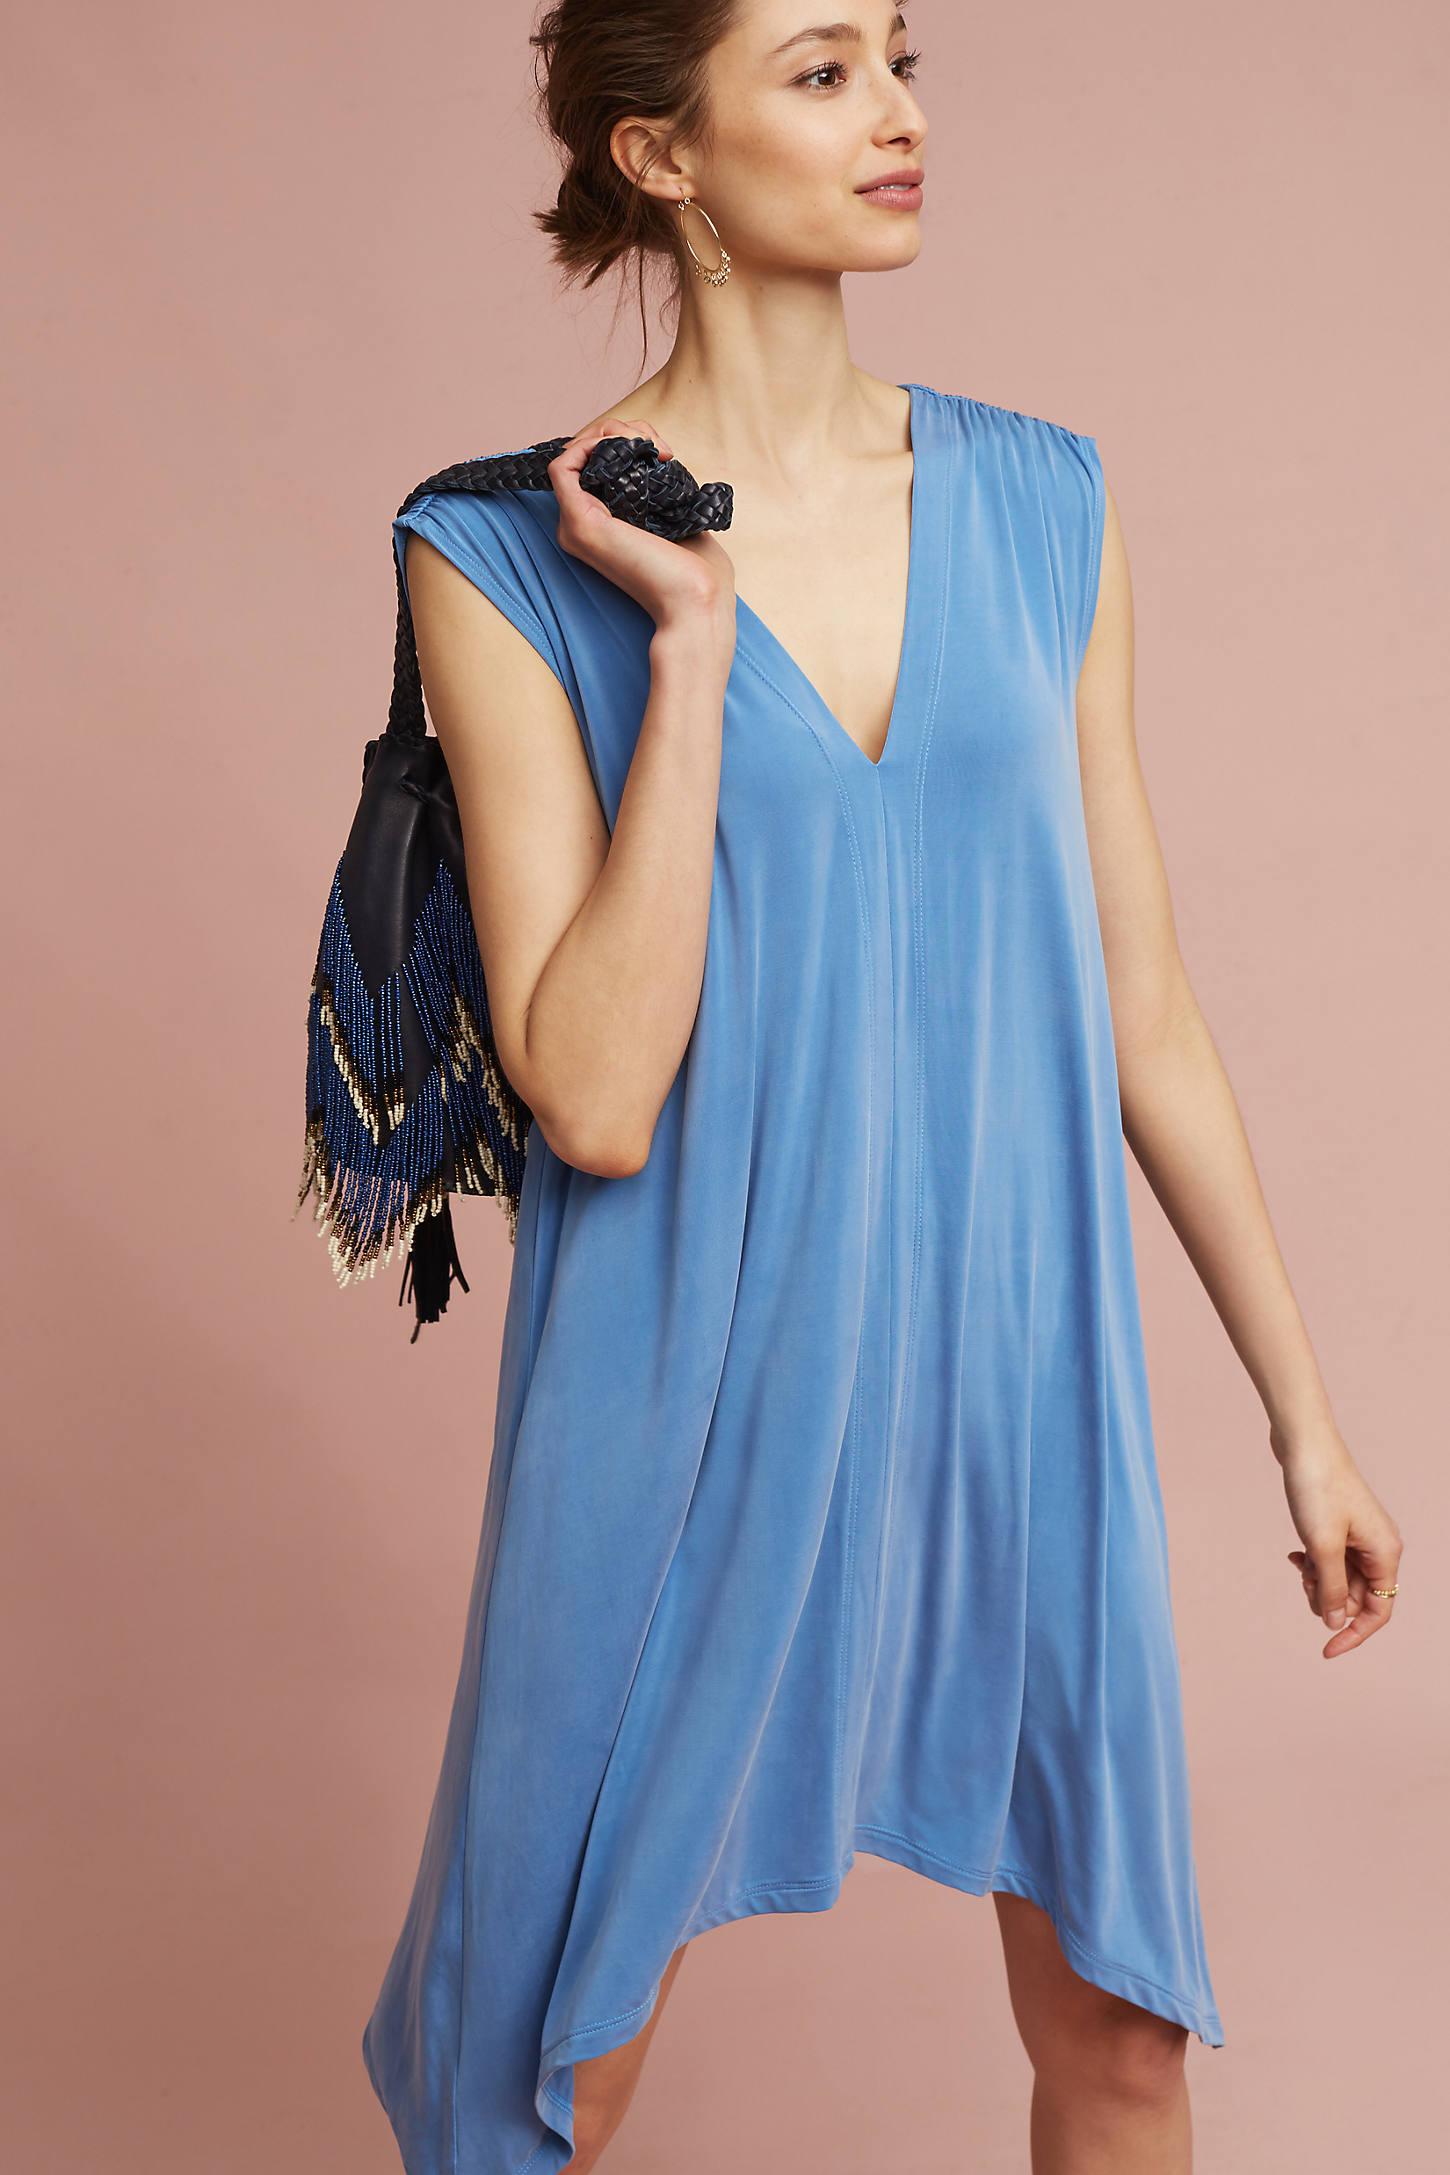 Briella Tunic Dress